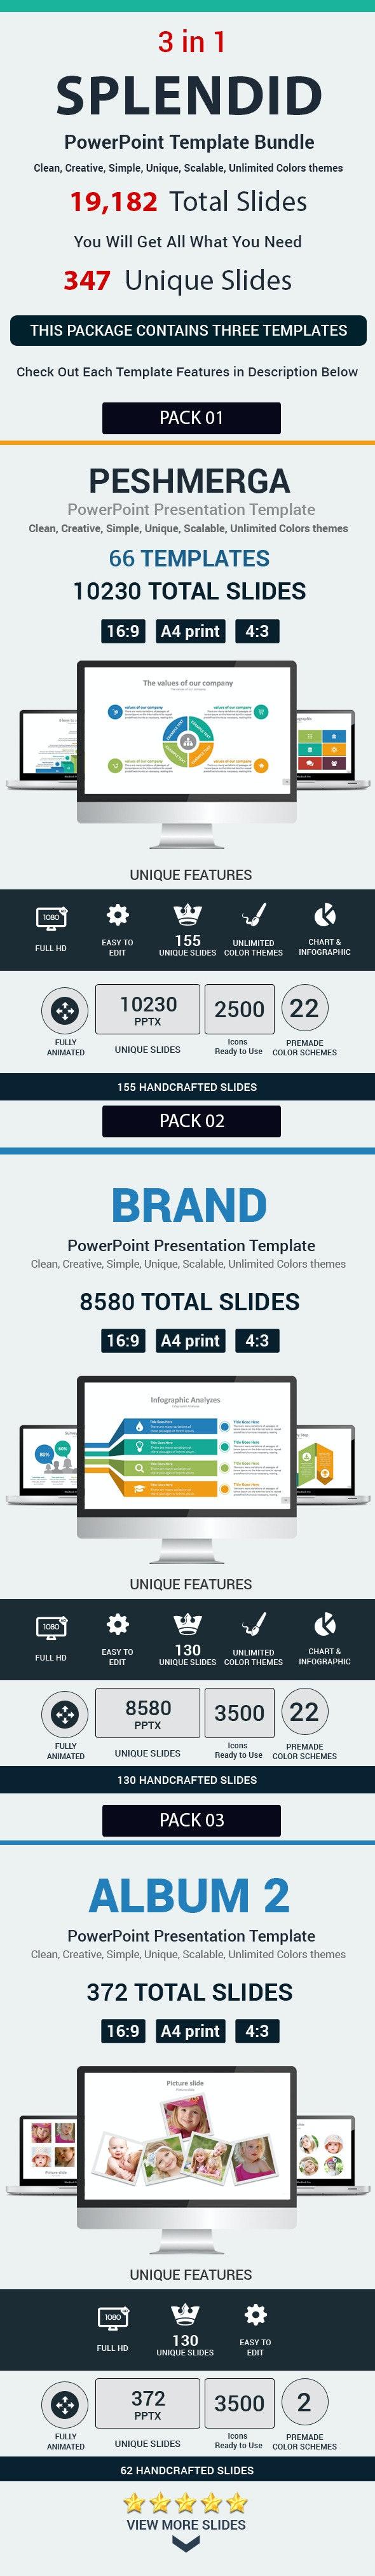 Splendid 3 in 1 PowerPoint Template Bundle - Business PowerPoint Templates